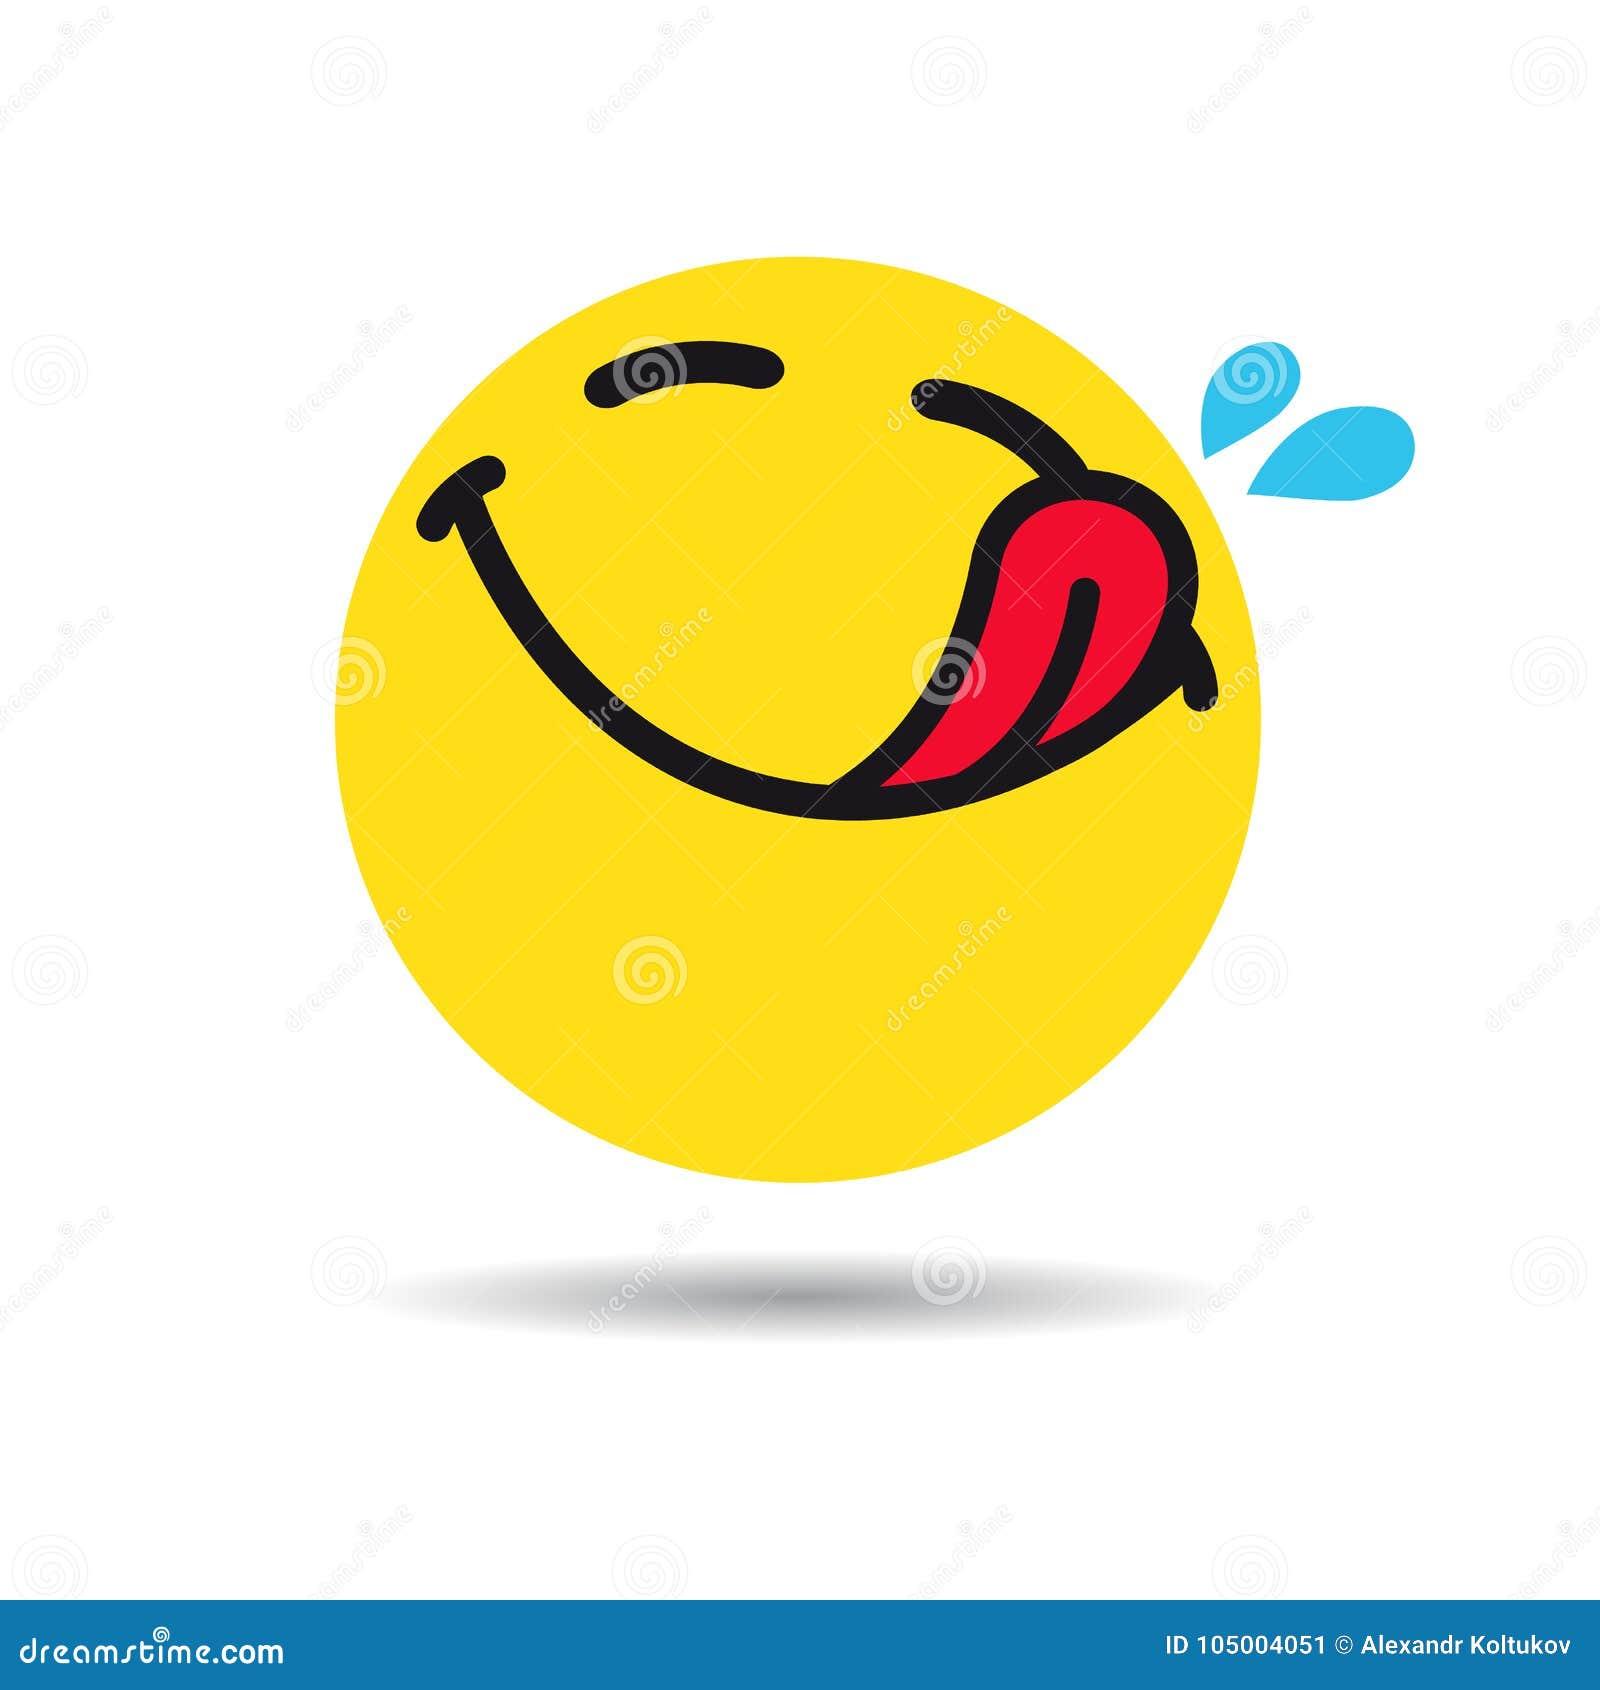 Hungry Emoticon Or Emoji Symbol Stock Vector Illustration Of